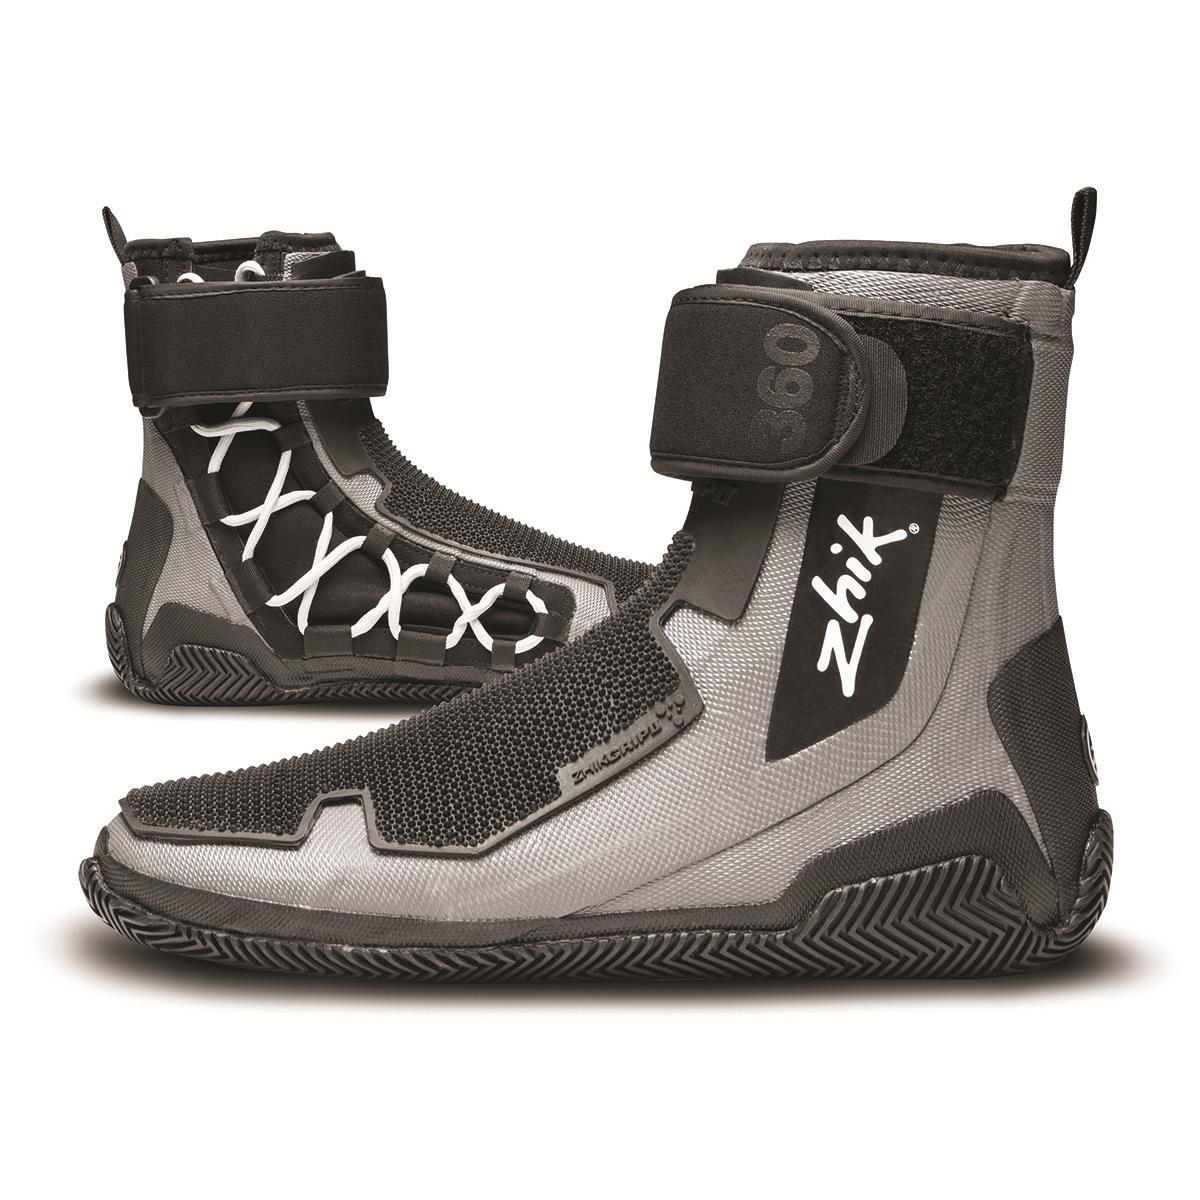 Zhik 360 sailing boots